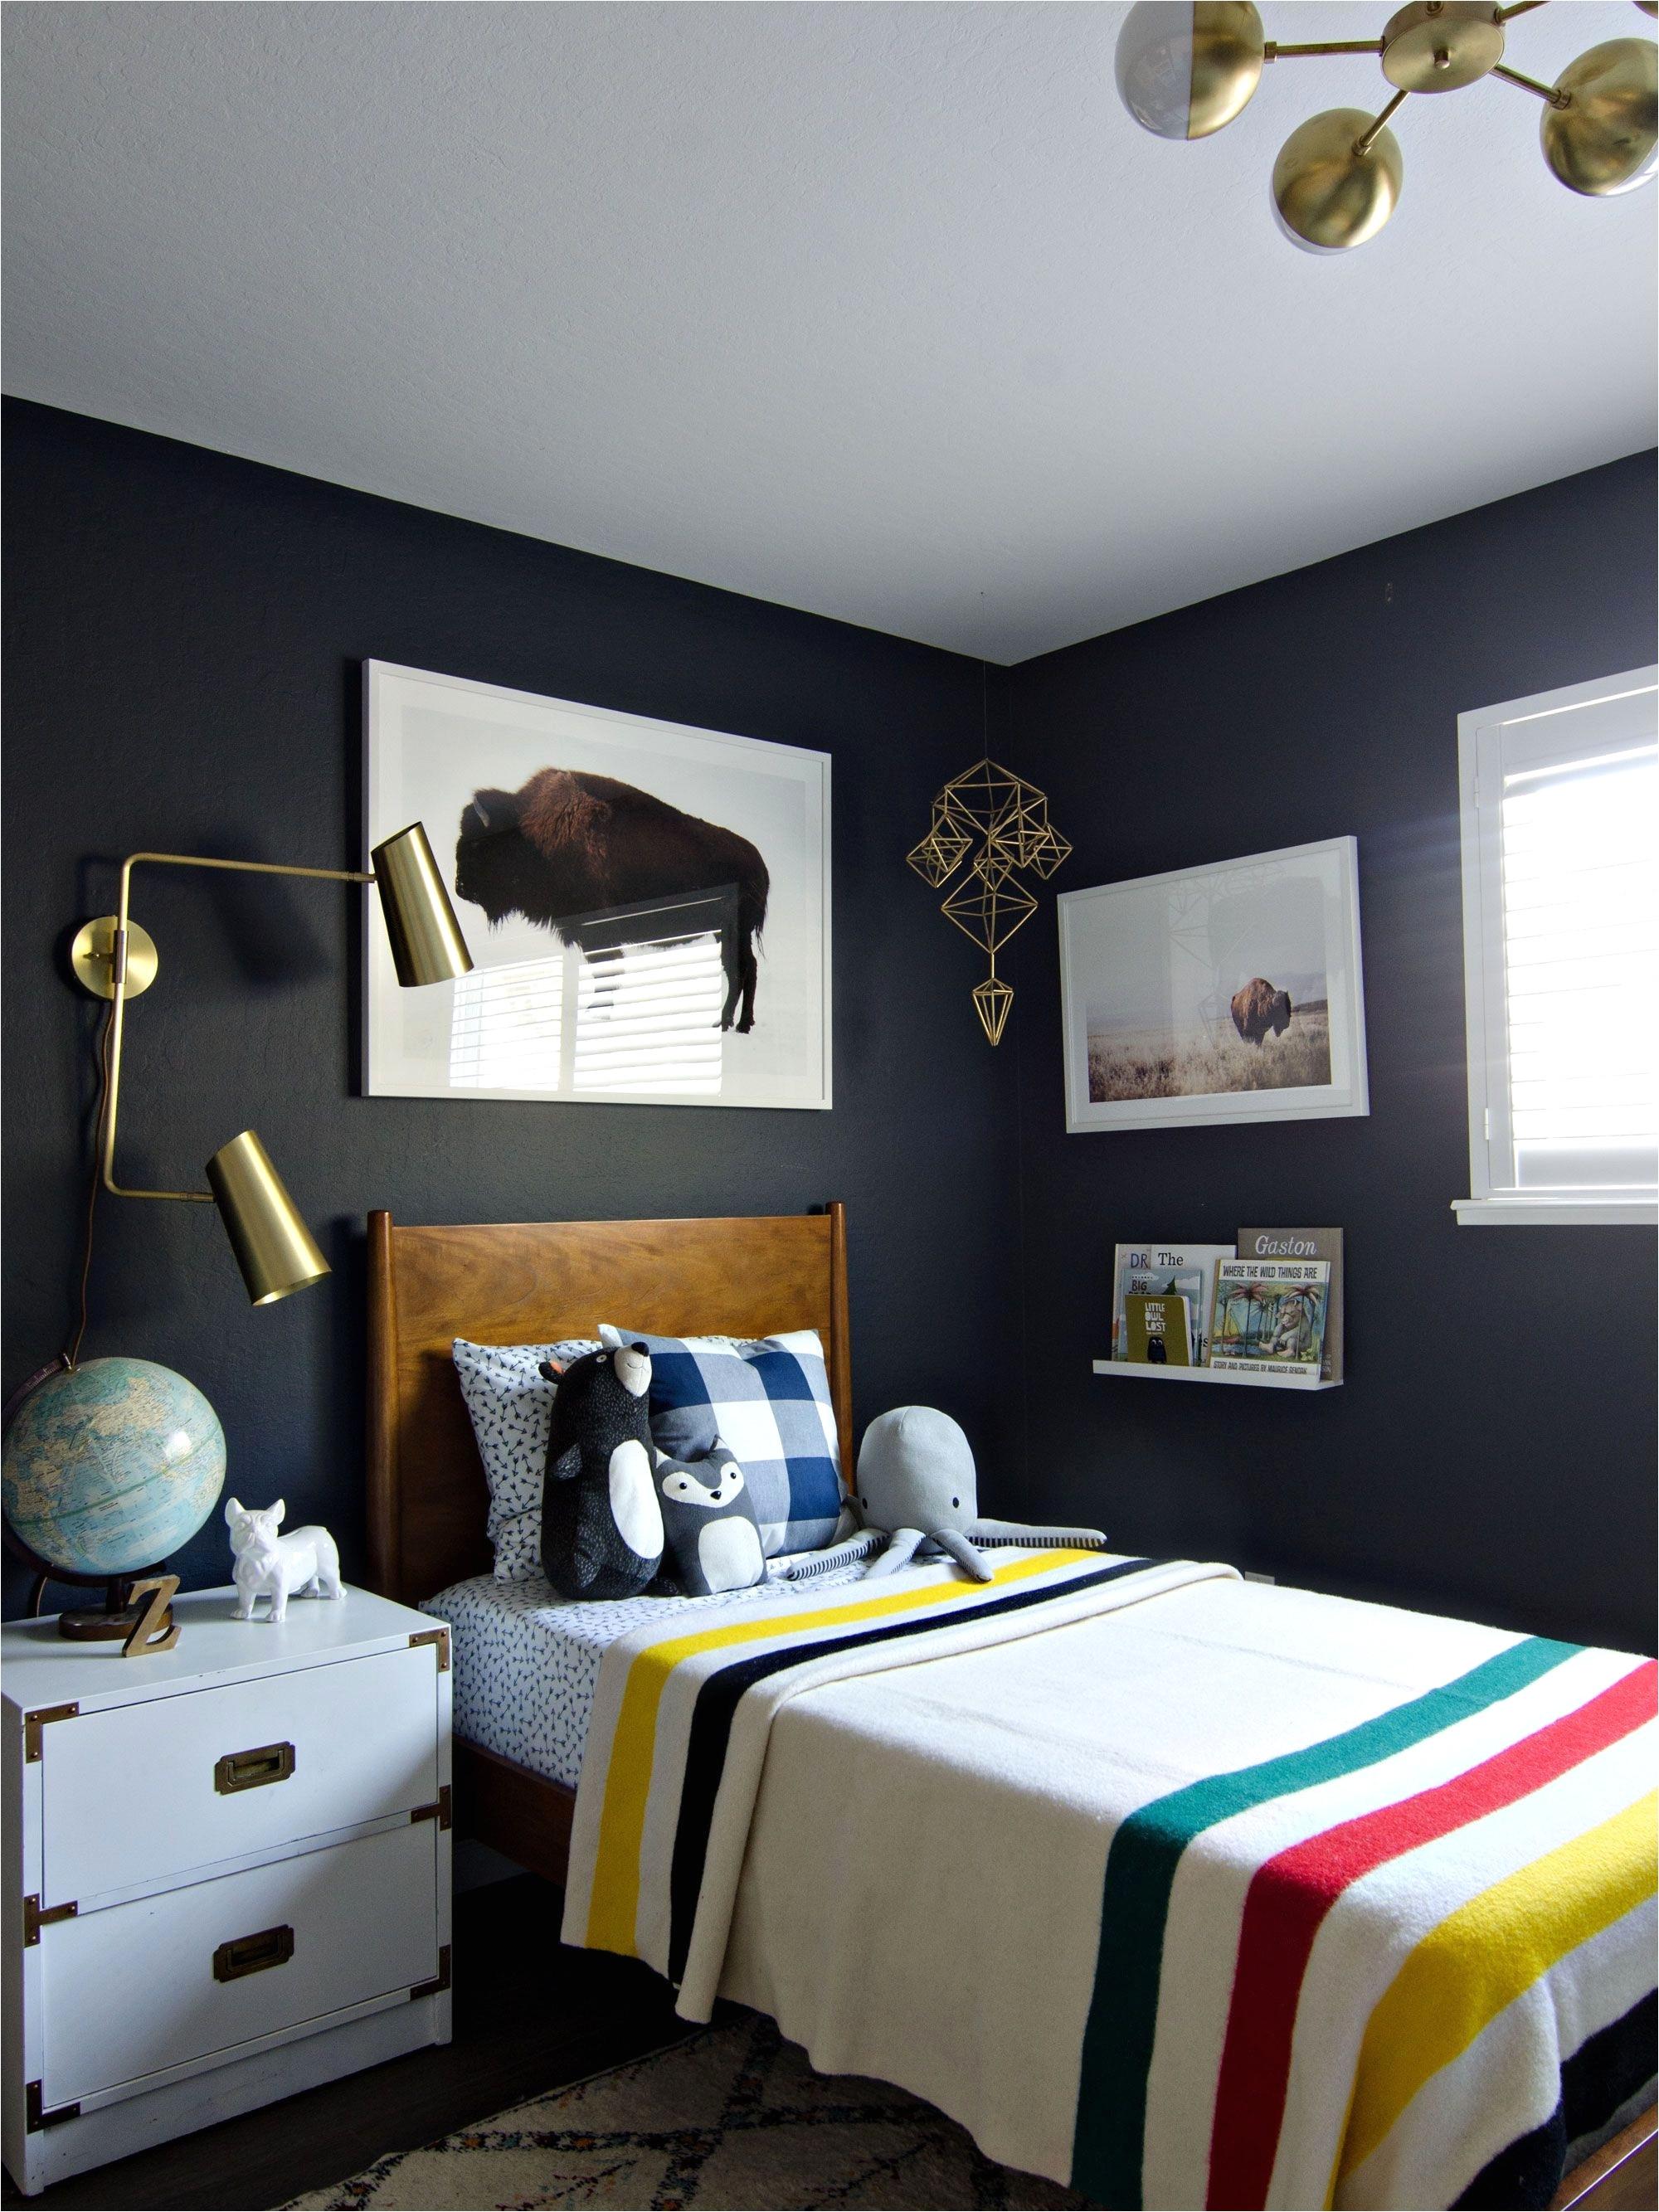 Wall Decorating Ideas For Bedrooms Unique Light Grey Small Bedroom Beautiful Media Cache Ec0 Pinimg 736x Cd 0d